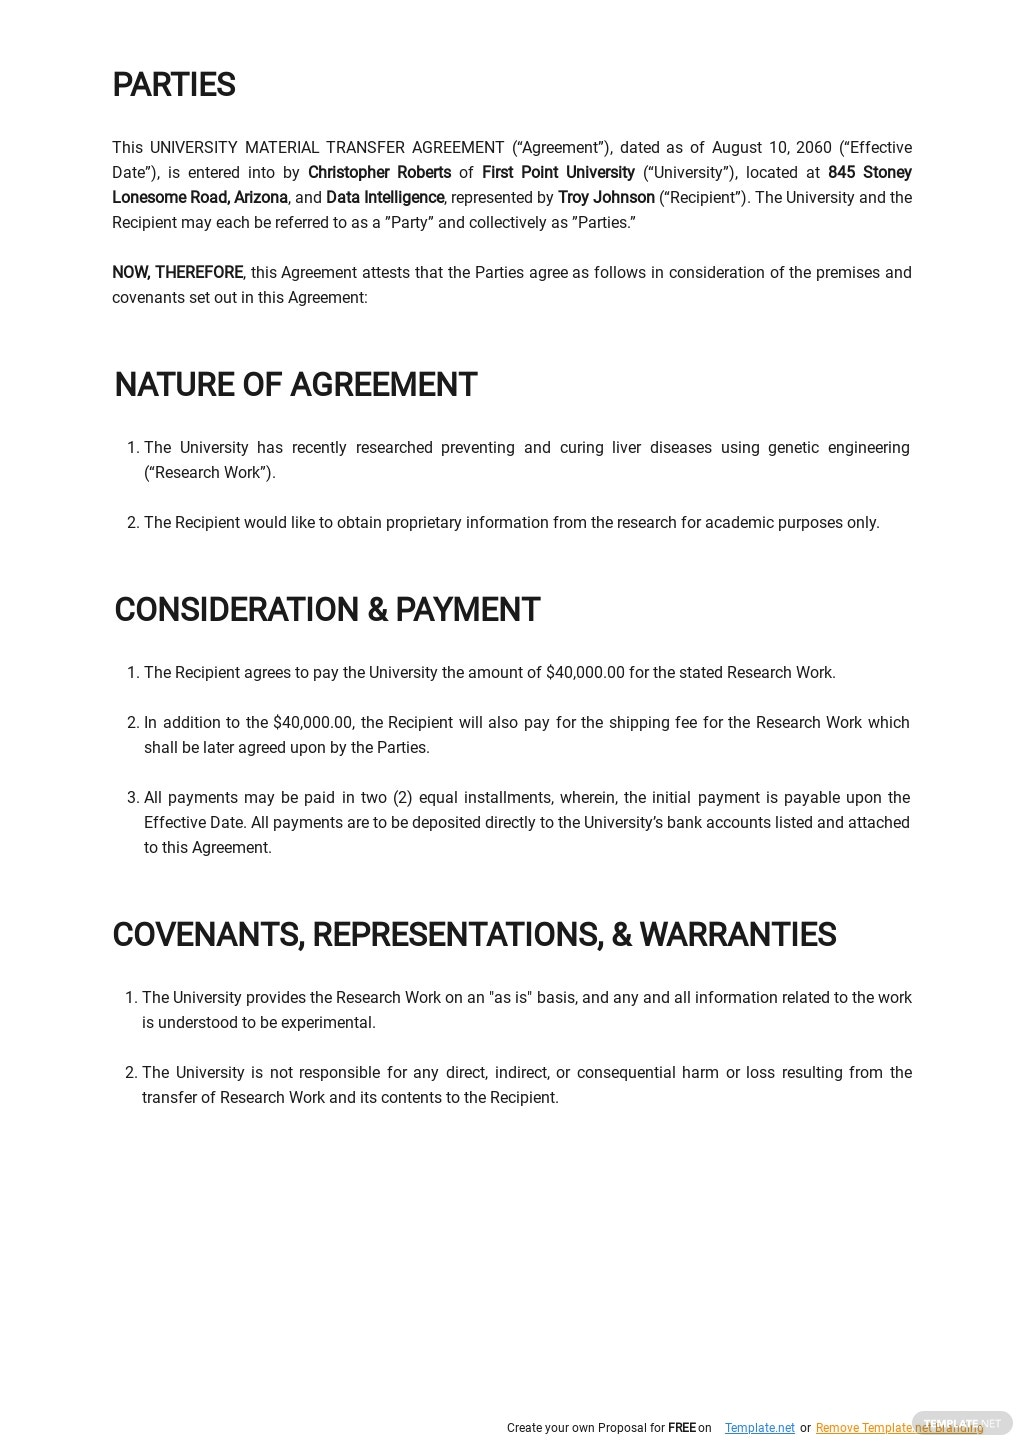 University Material Transfer Agreement Template  1.jpe